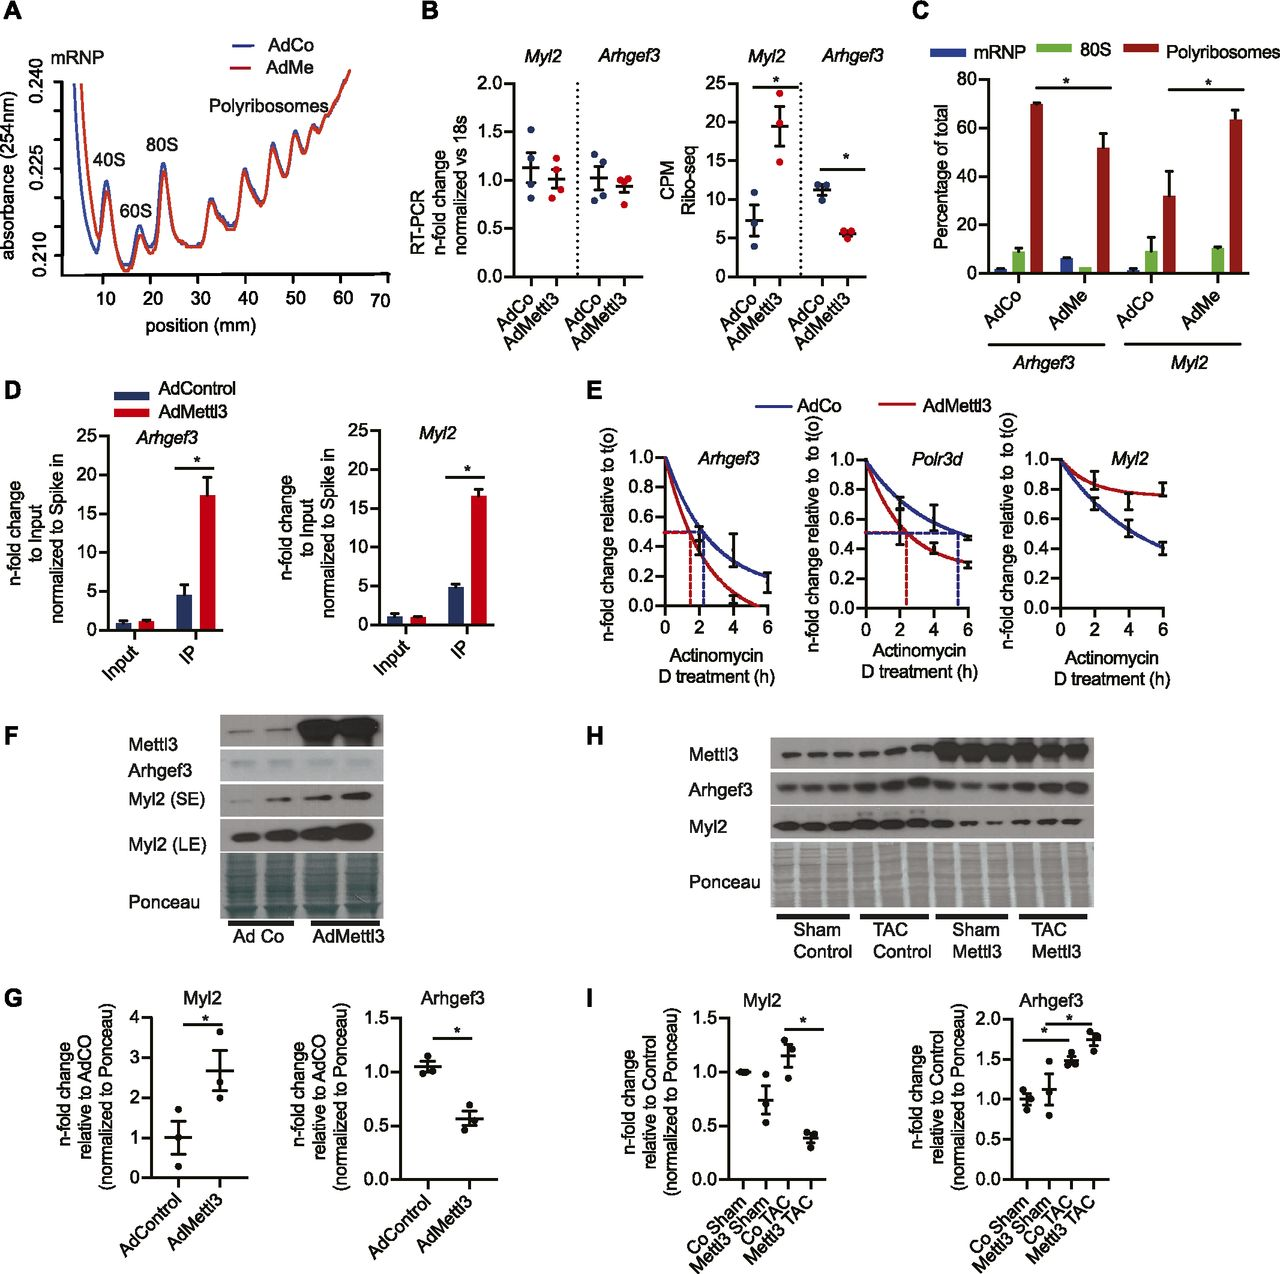 m6A-mRNA methylation regulates cardiac gene expression and cellular